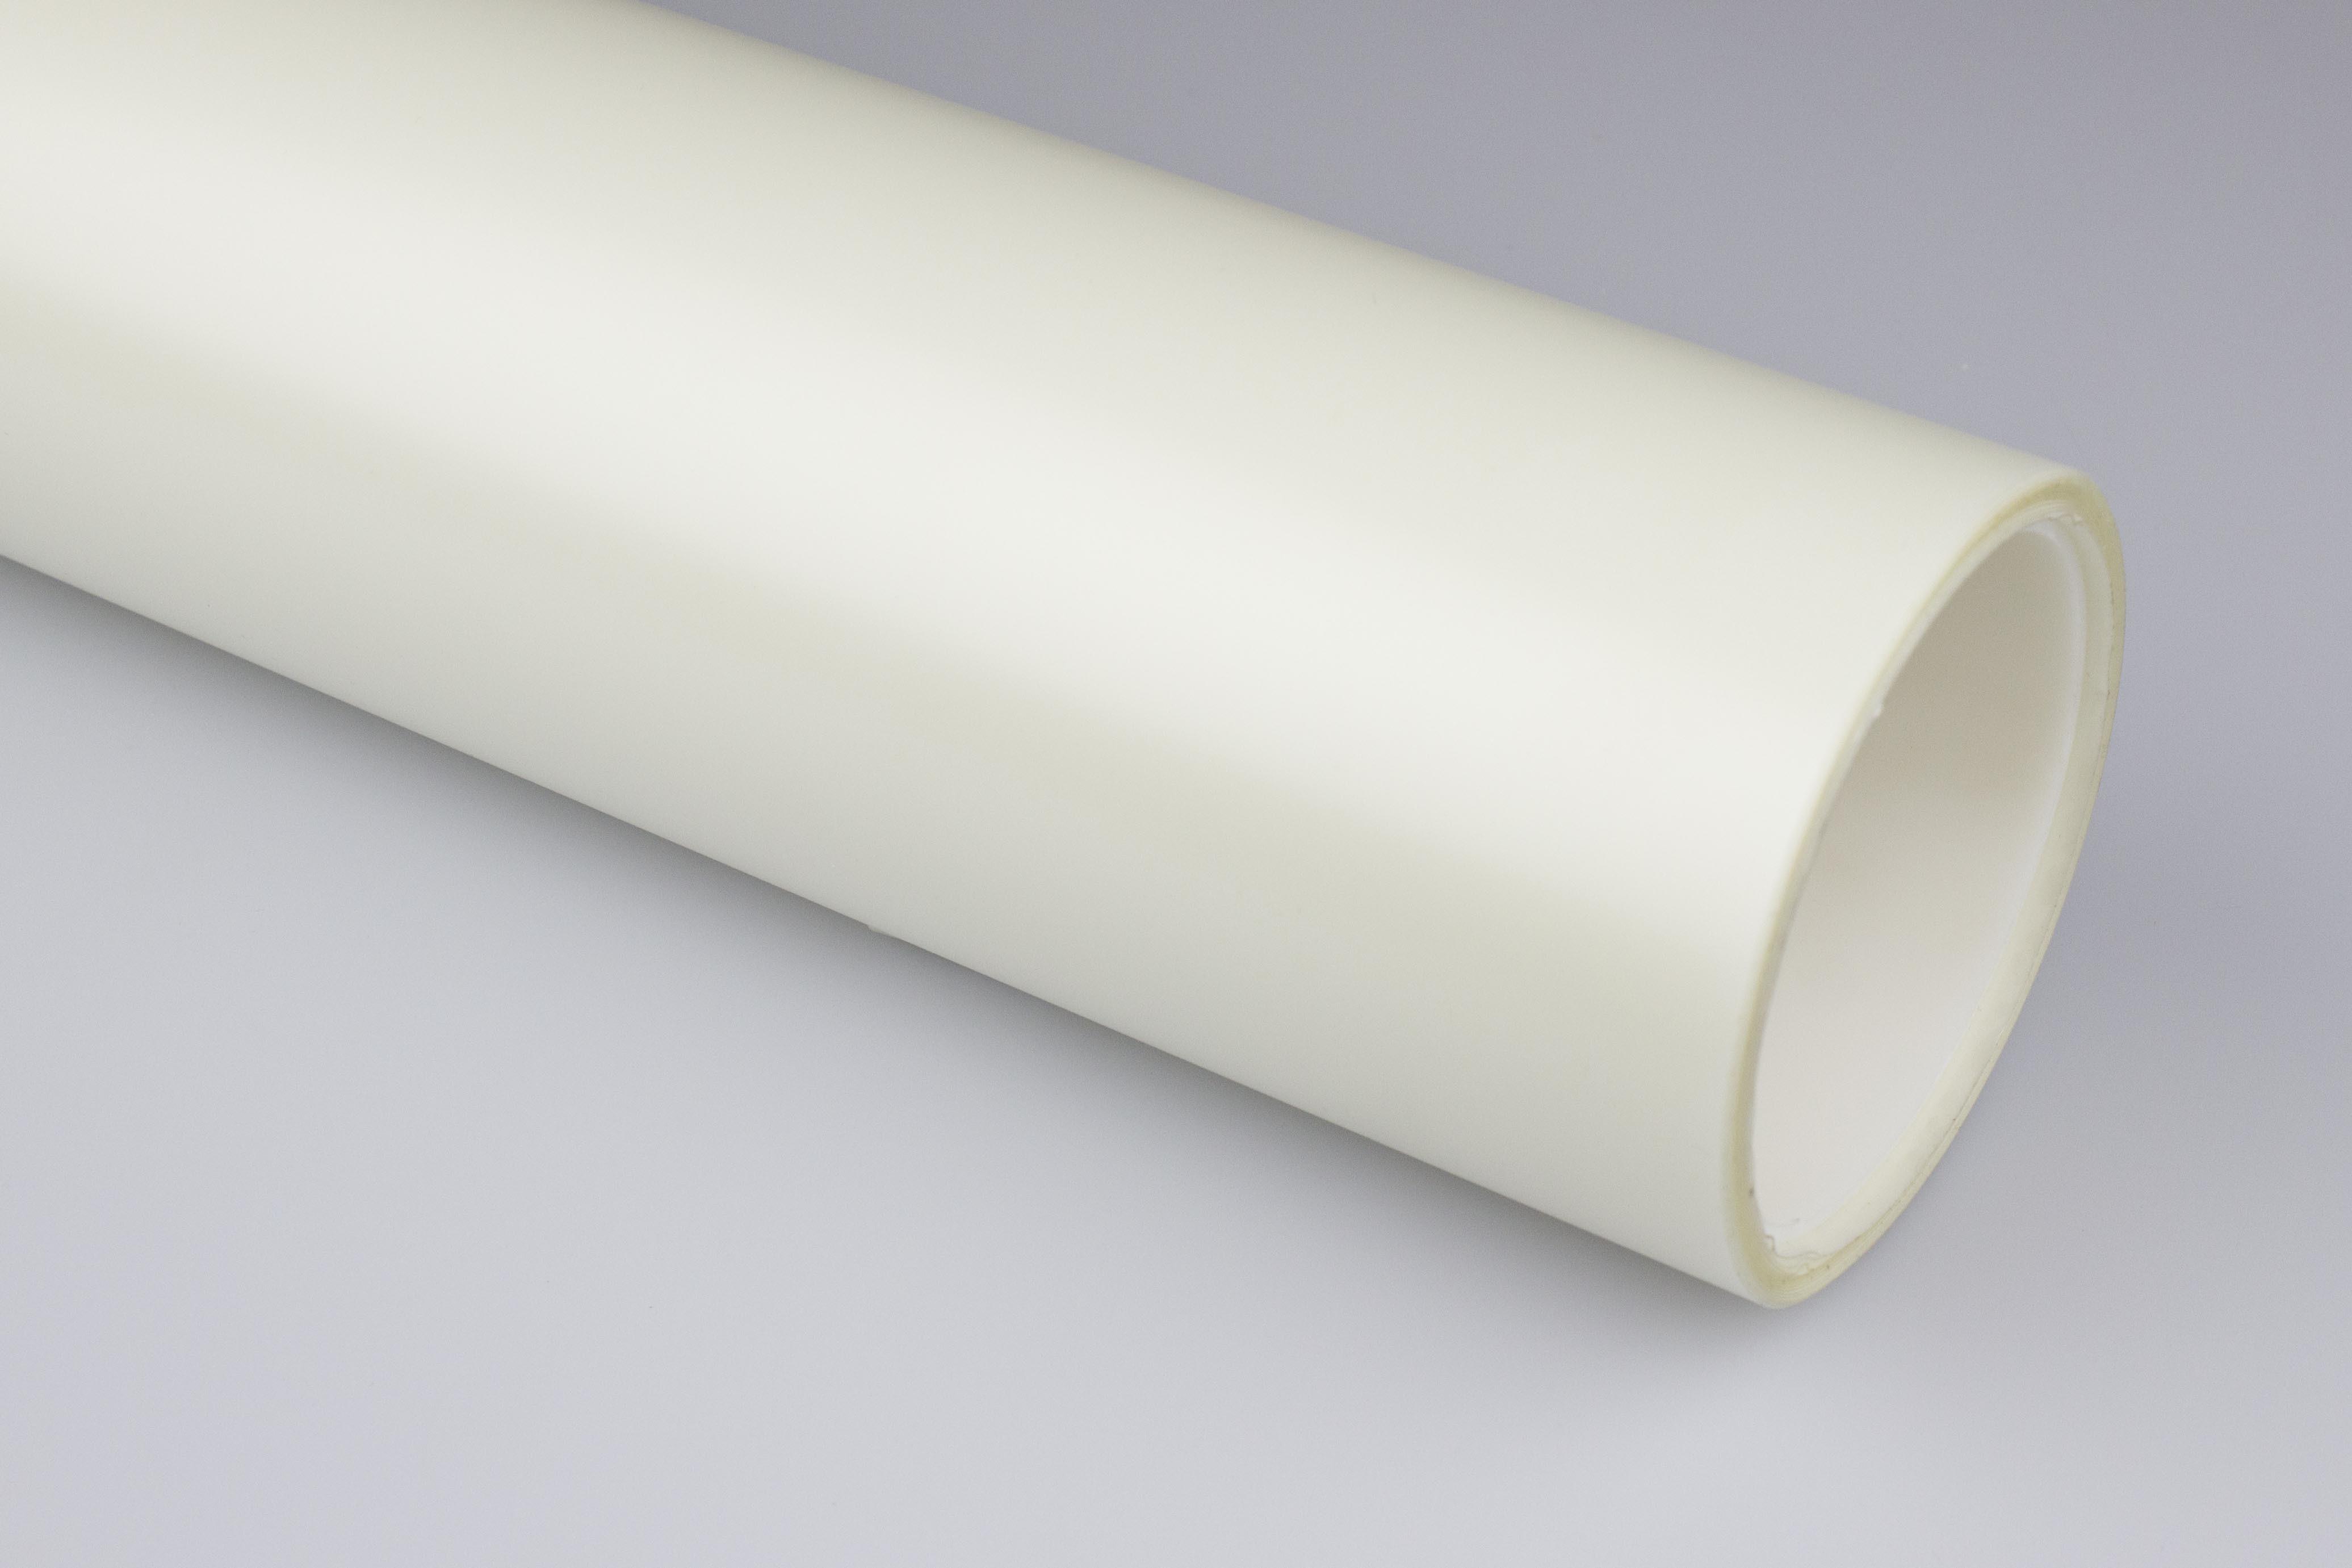 Endurance PU Paint Protection Film STX160 1,524